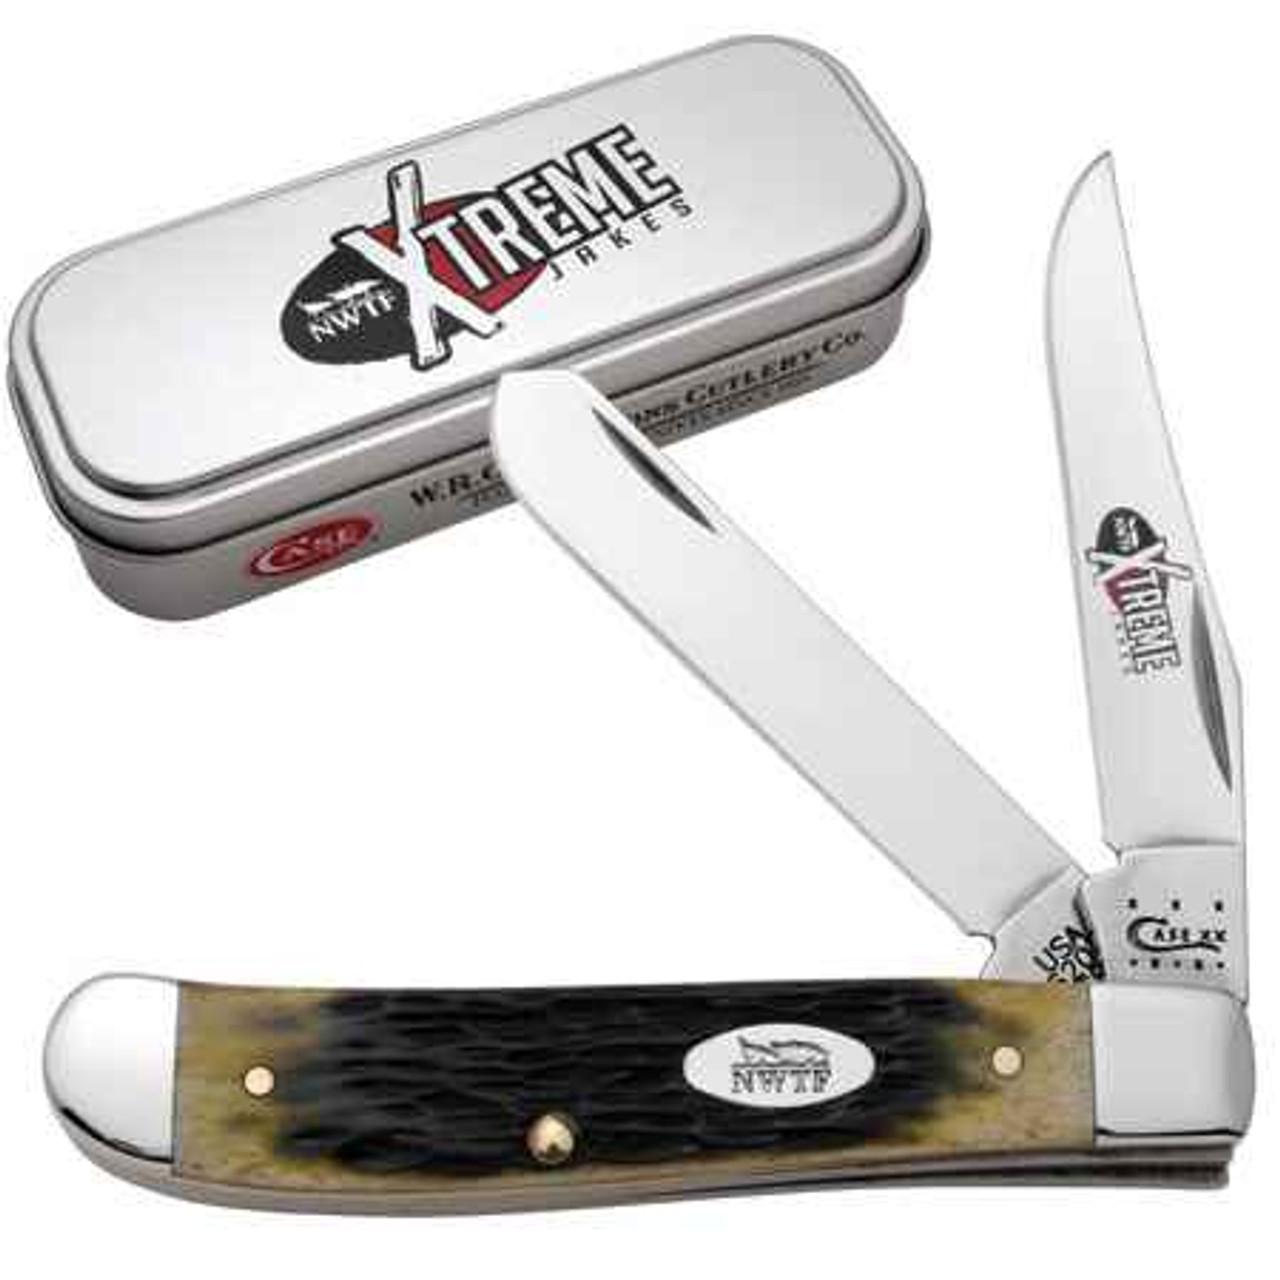 Case 8961 Mini Trapper Extreme Jakes NWTF, Olive Green Jigged Bone, Gift Tin (6207 SS)